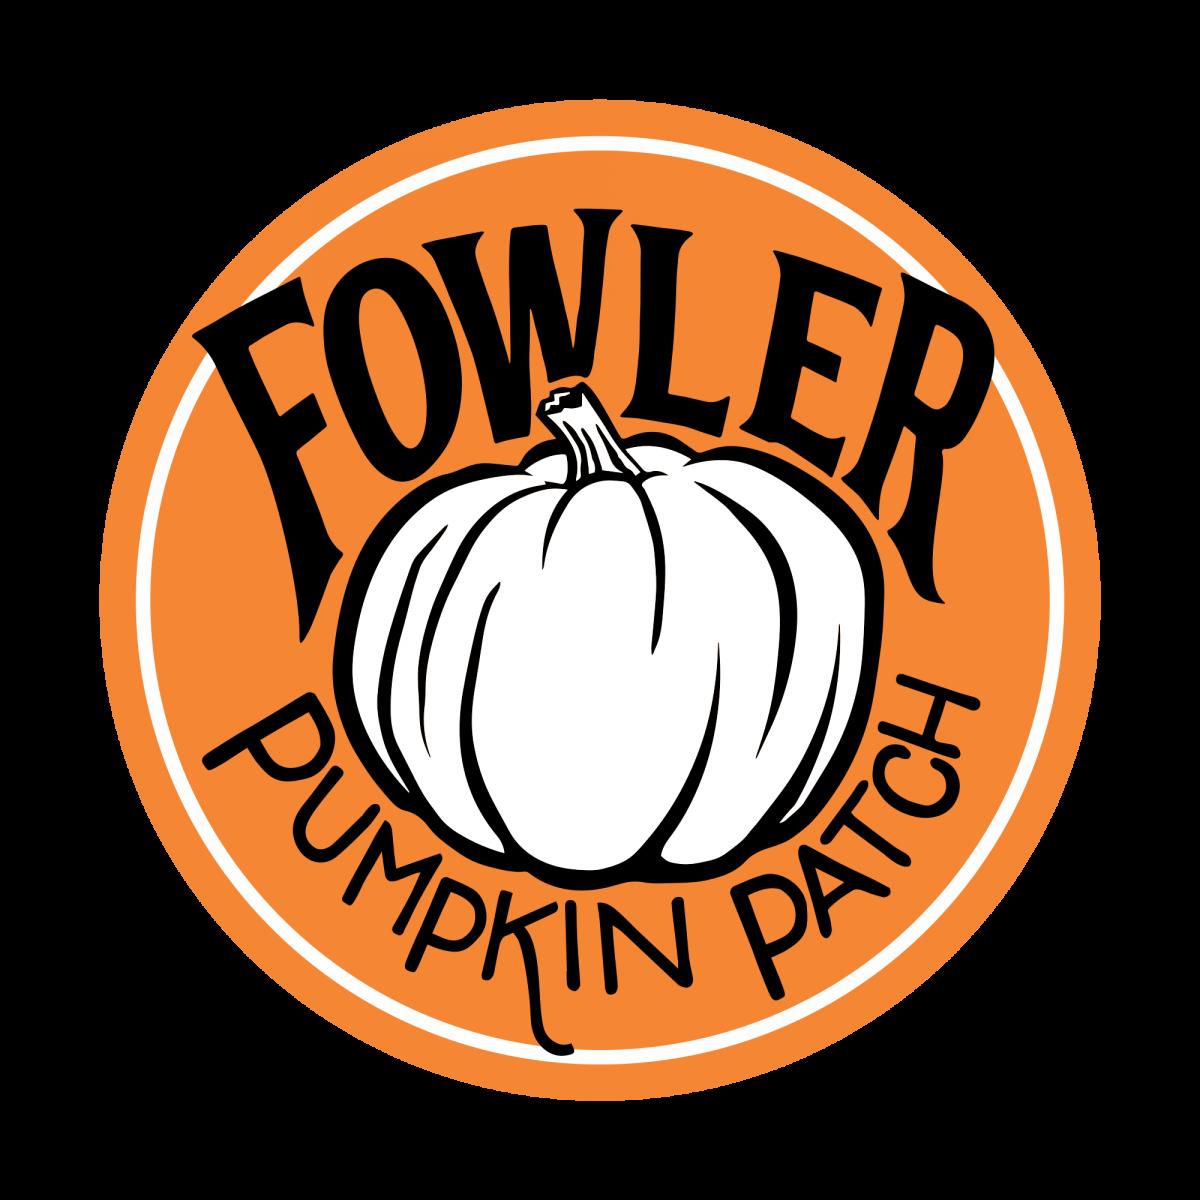 fowler-pumpkin-patch-logo-orange-circle